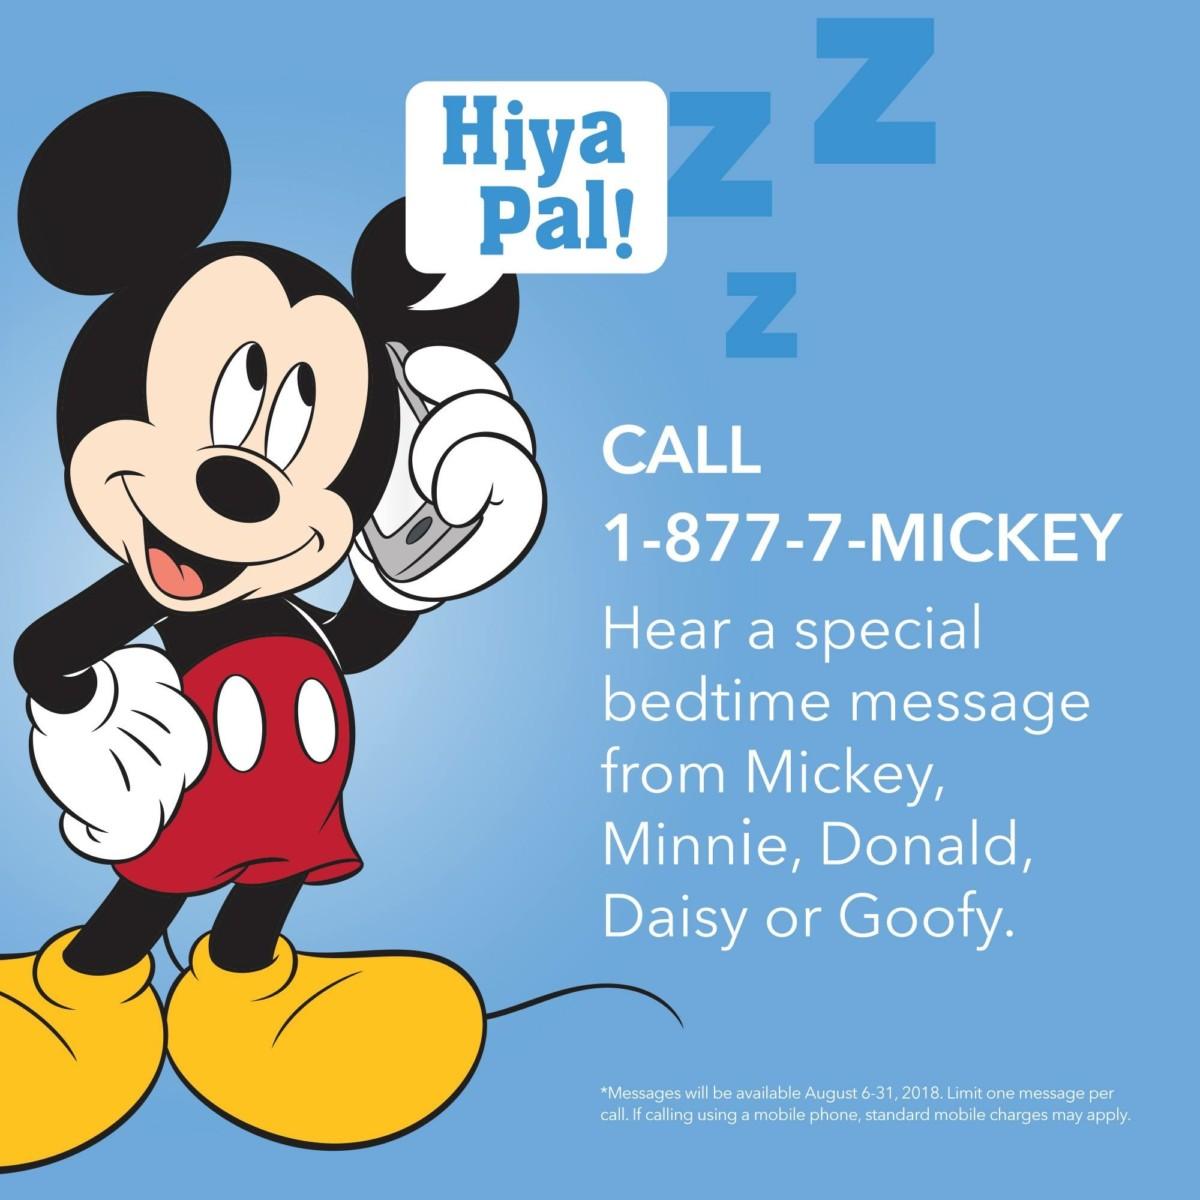 Introducing Disney Store's Sleep Shop Hotline! 1